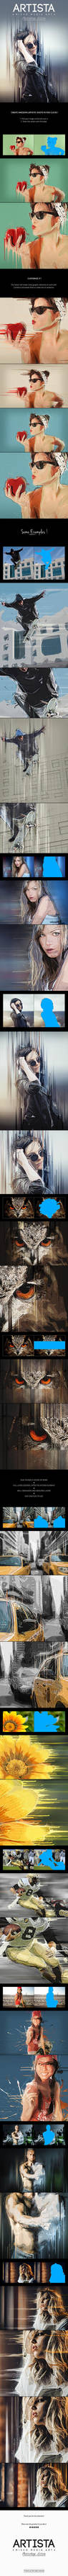 Artista - Mixed Media Art Photoshop Action by NuwanP